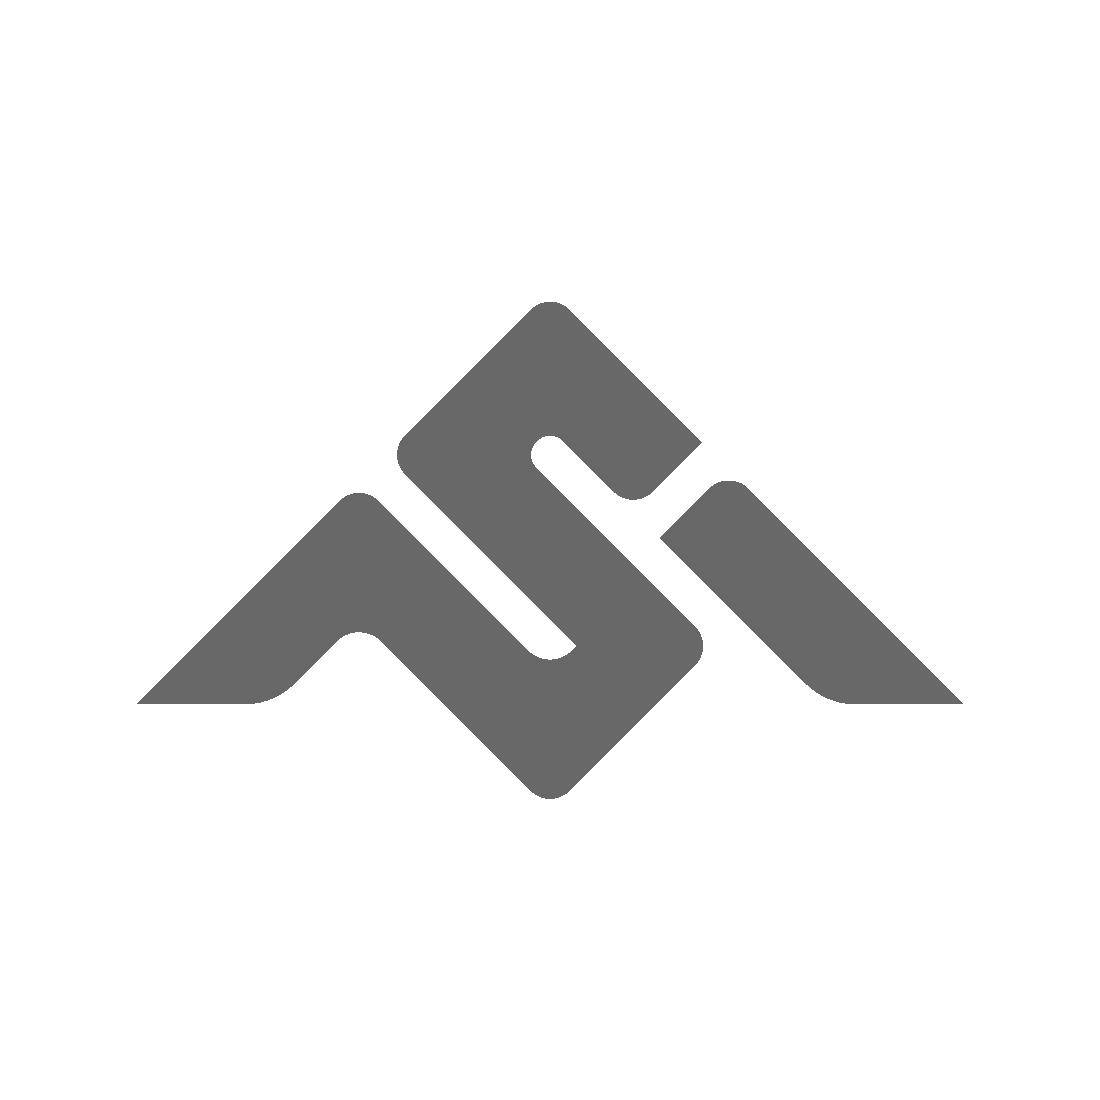 kahuna longboard drop deck 43 39 39 bamboo kaufen longboard. Black Bedroom Furniture Sets. Home Design Ideas